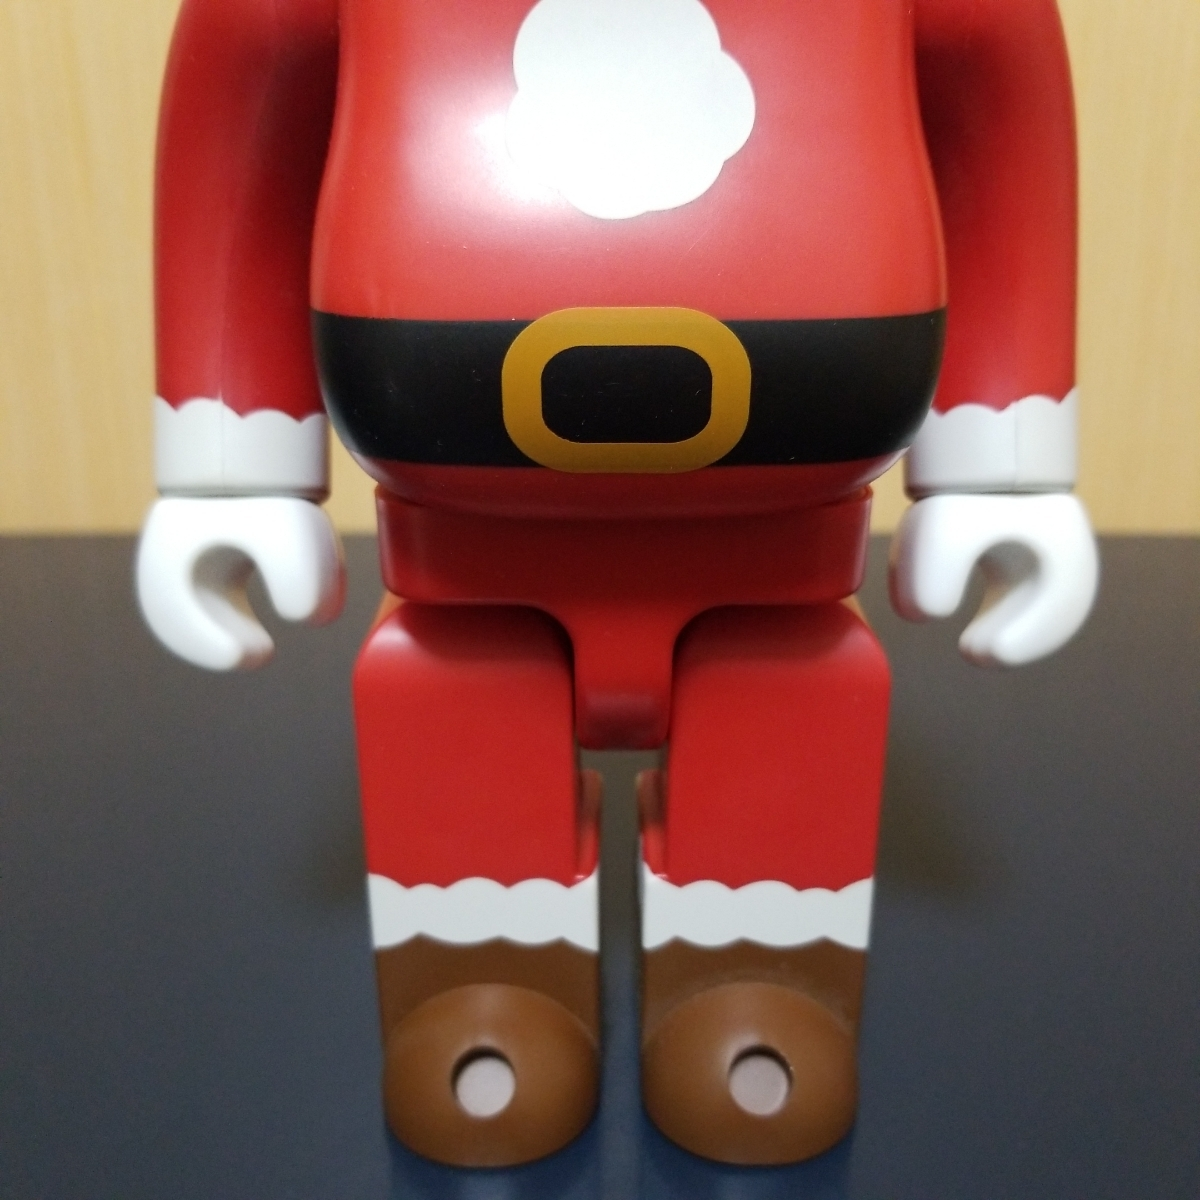 MEDICOM TOY メディコムトイ BE@RBRICK ベアブリック ミッキーマウス サンタver 特賞 400% サンタクロース_画像3